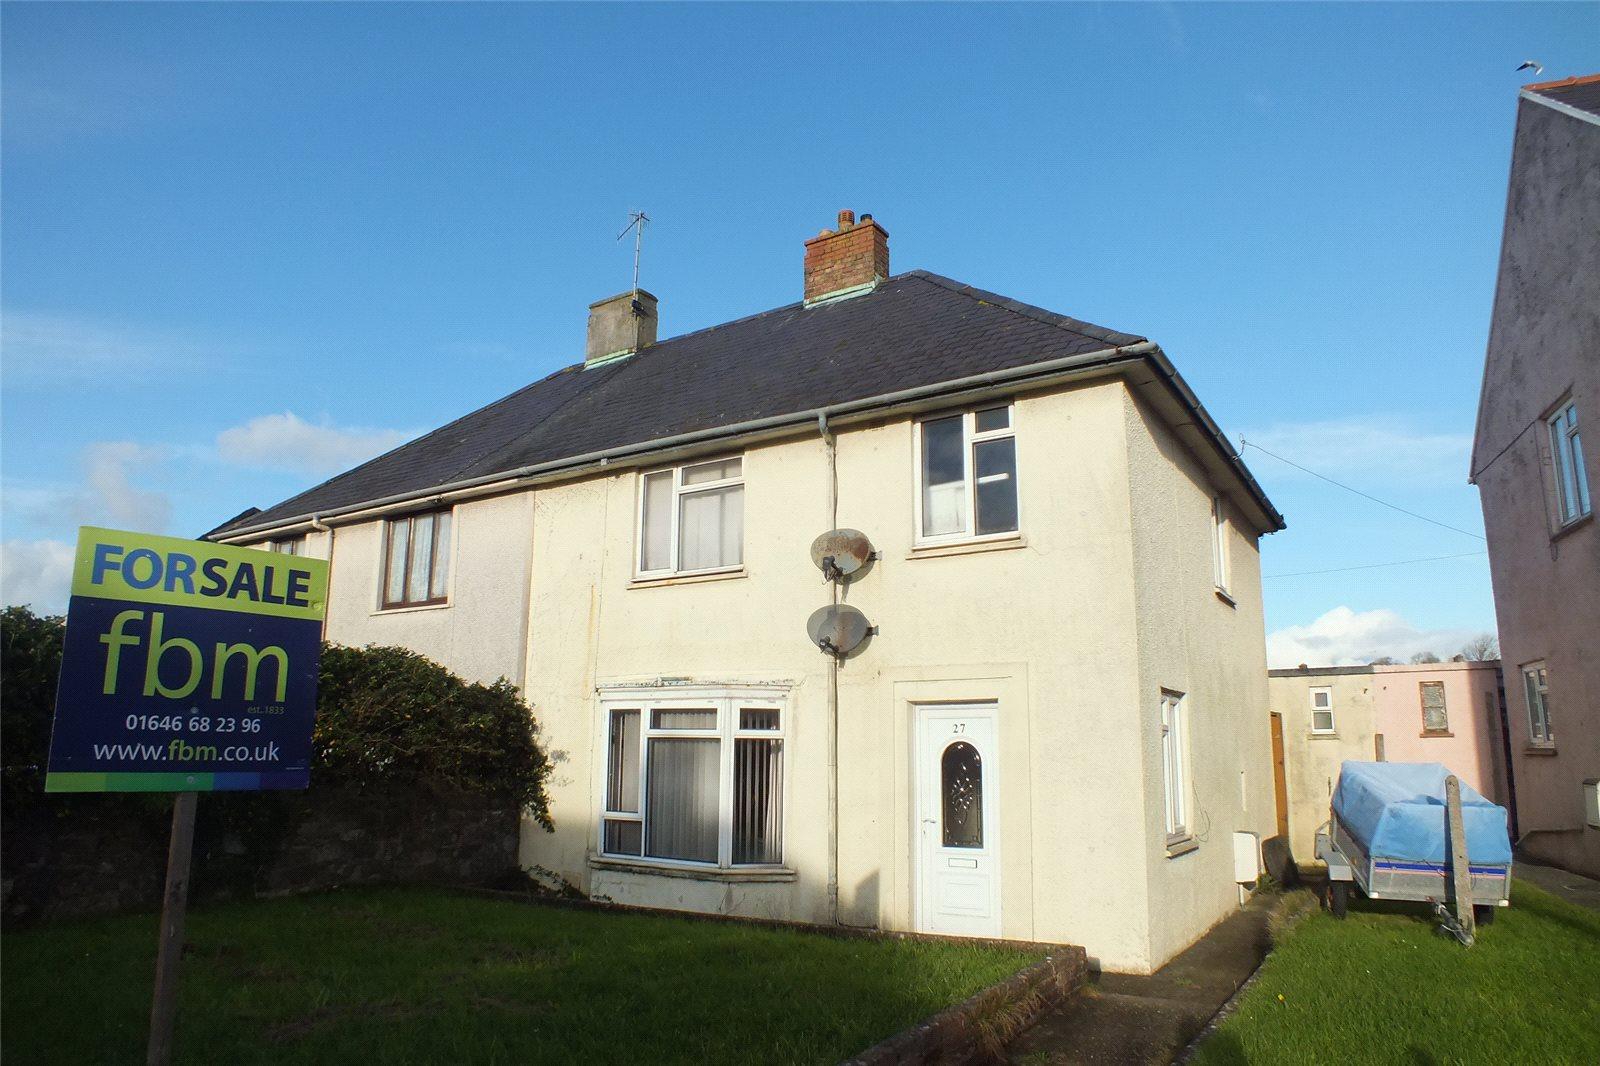 3 Bedrooms Semi Detached House for sale in St Annes Crescent, Pembroke, Pembrokeshire